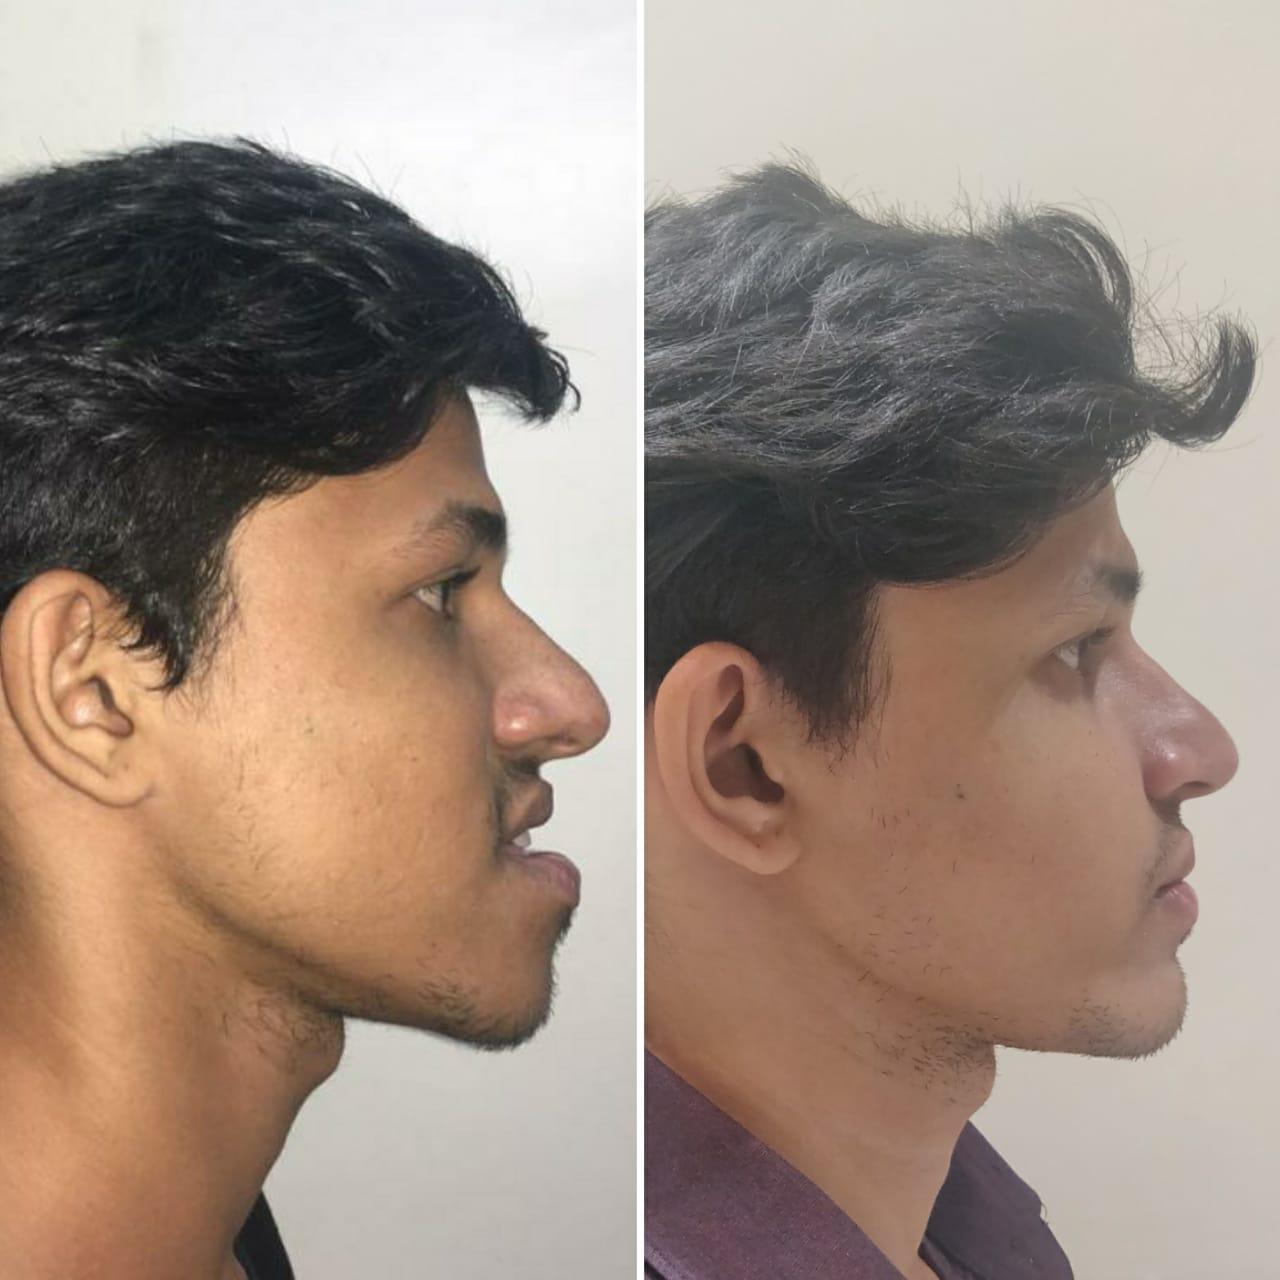 Othodontist in dubai